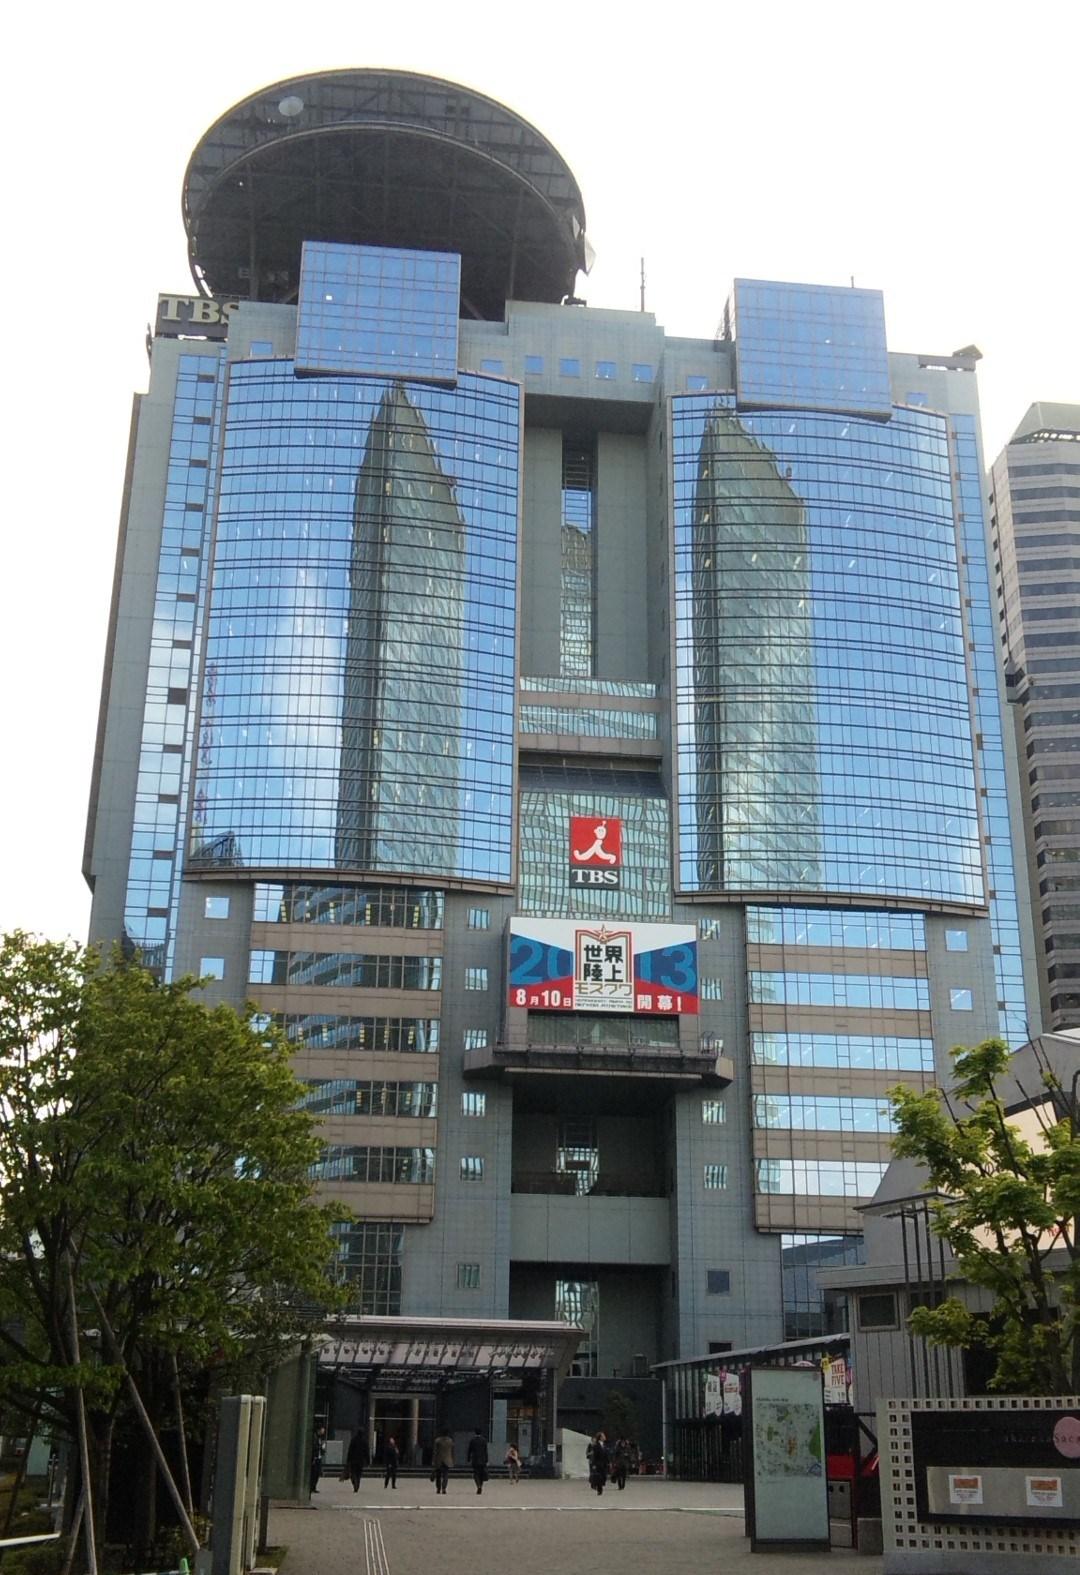 TBSテレビ - Wikipedia